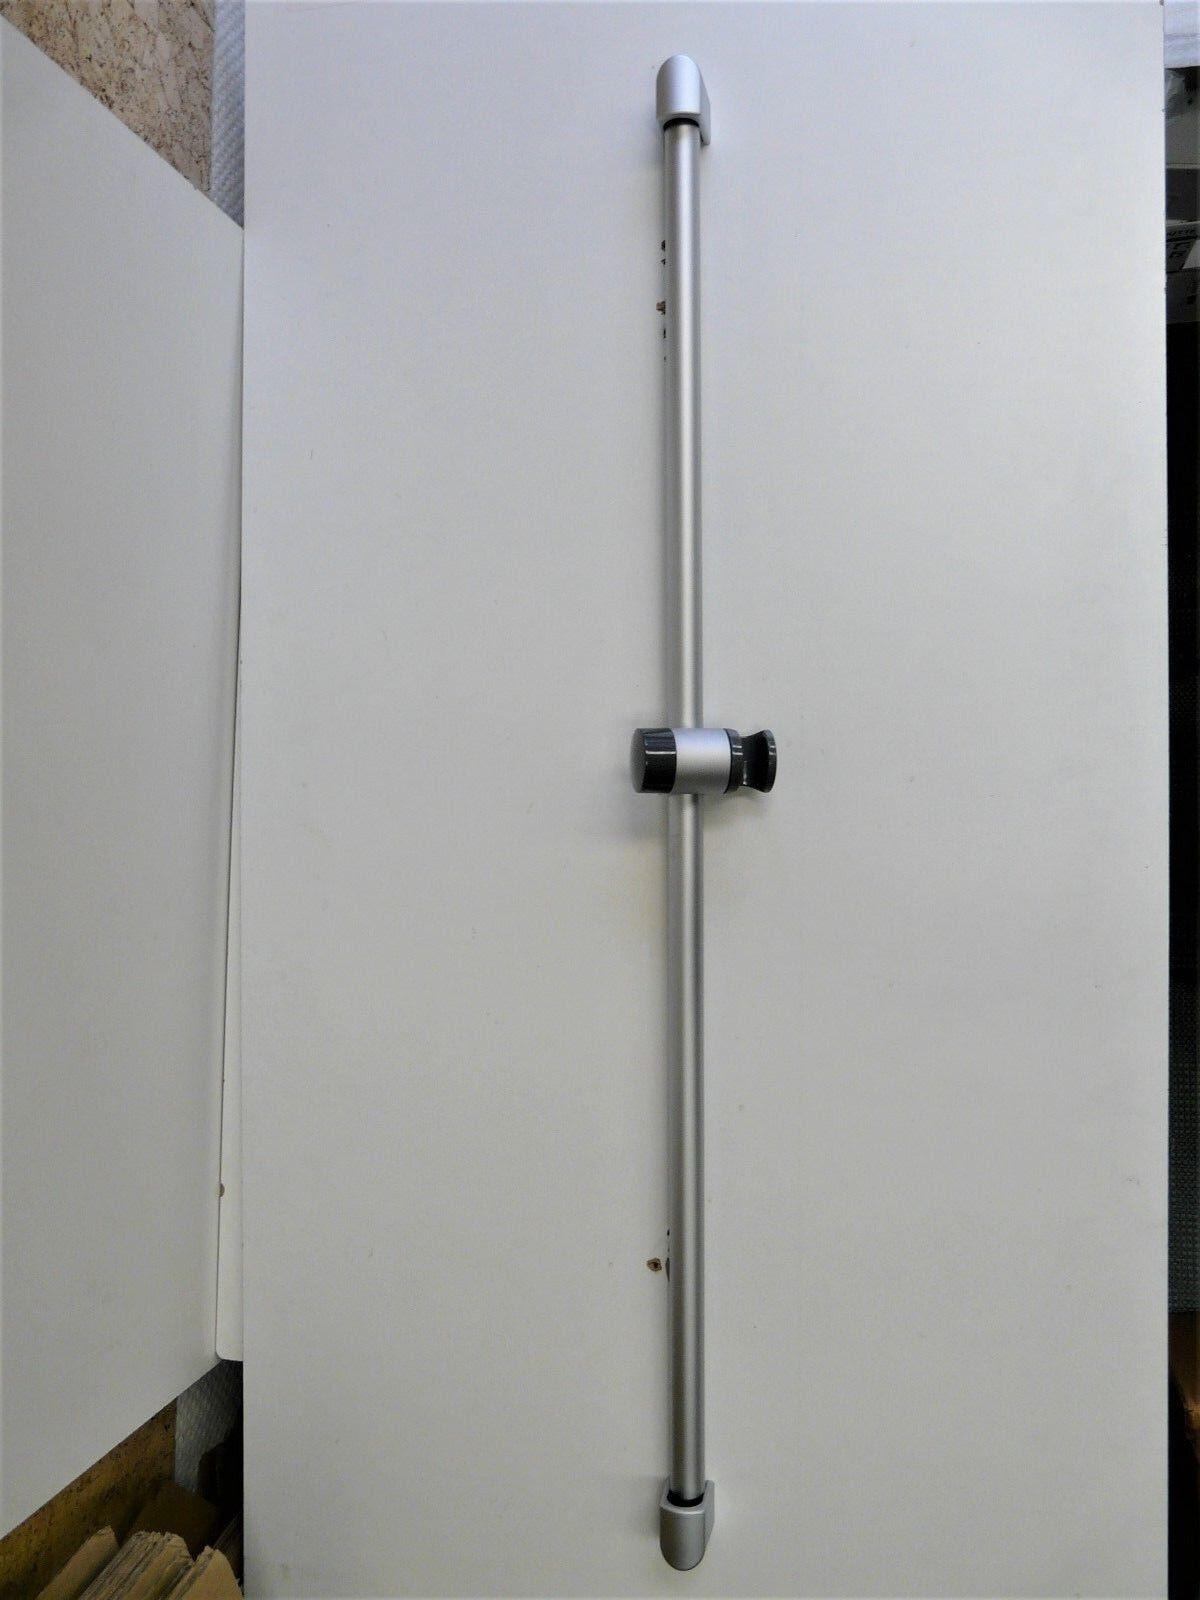 Asta Doccia cromo-opaco, 600mm, Asta Doccia, doccia, doccia, Asta